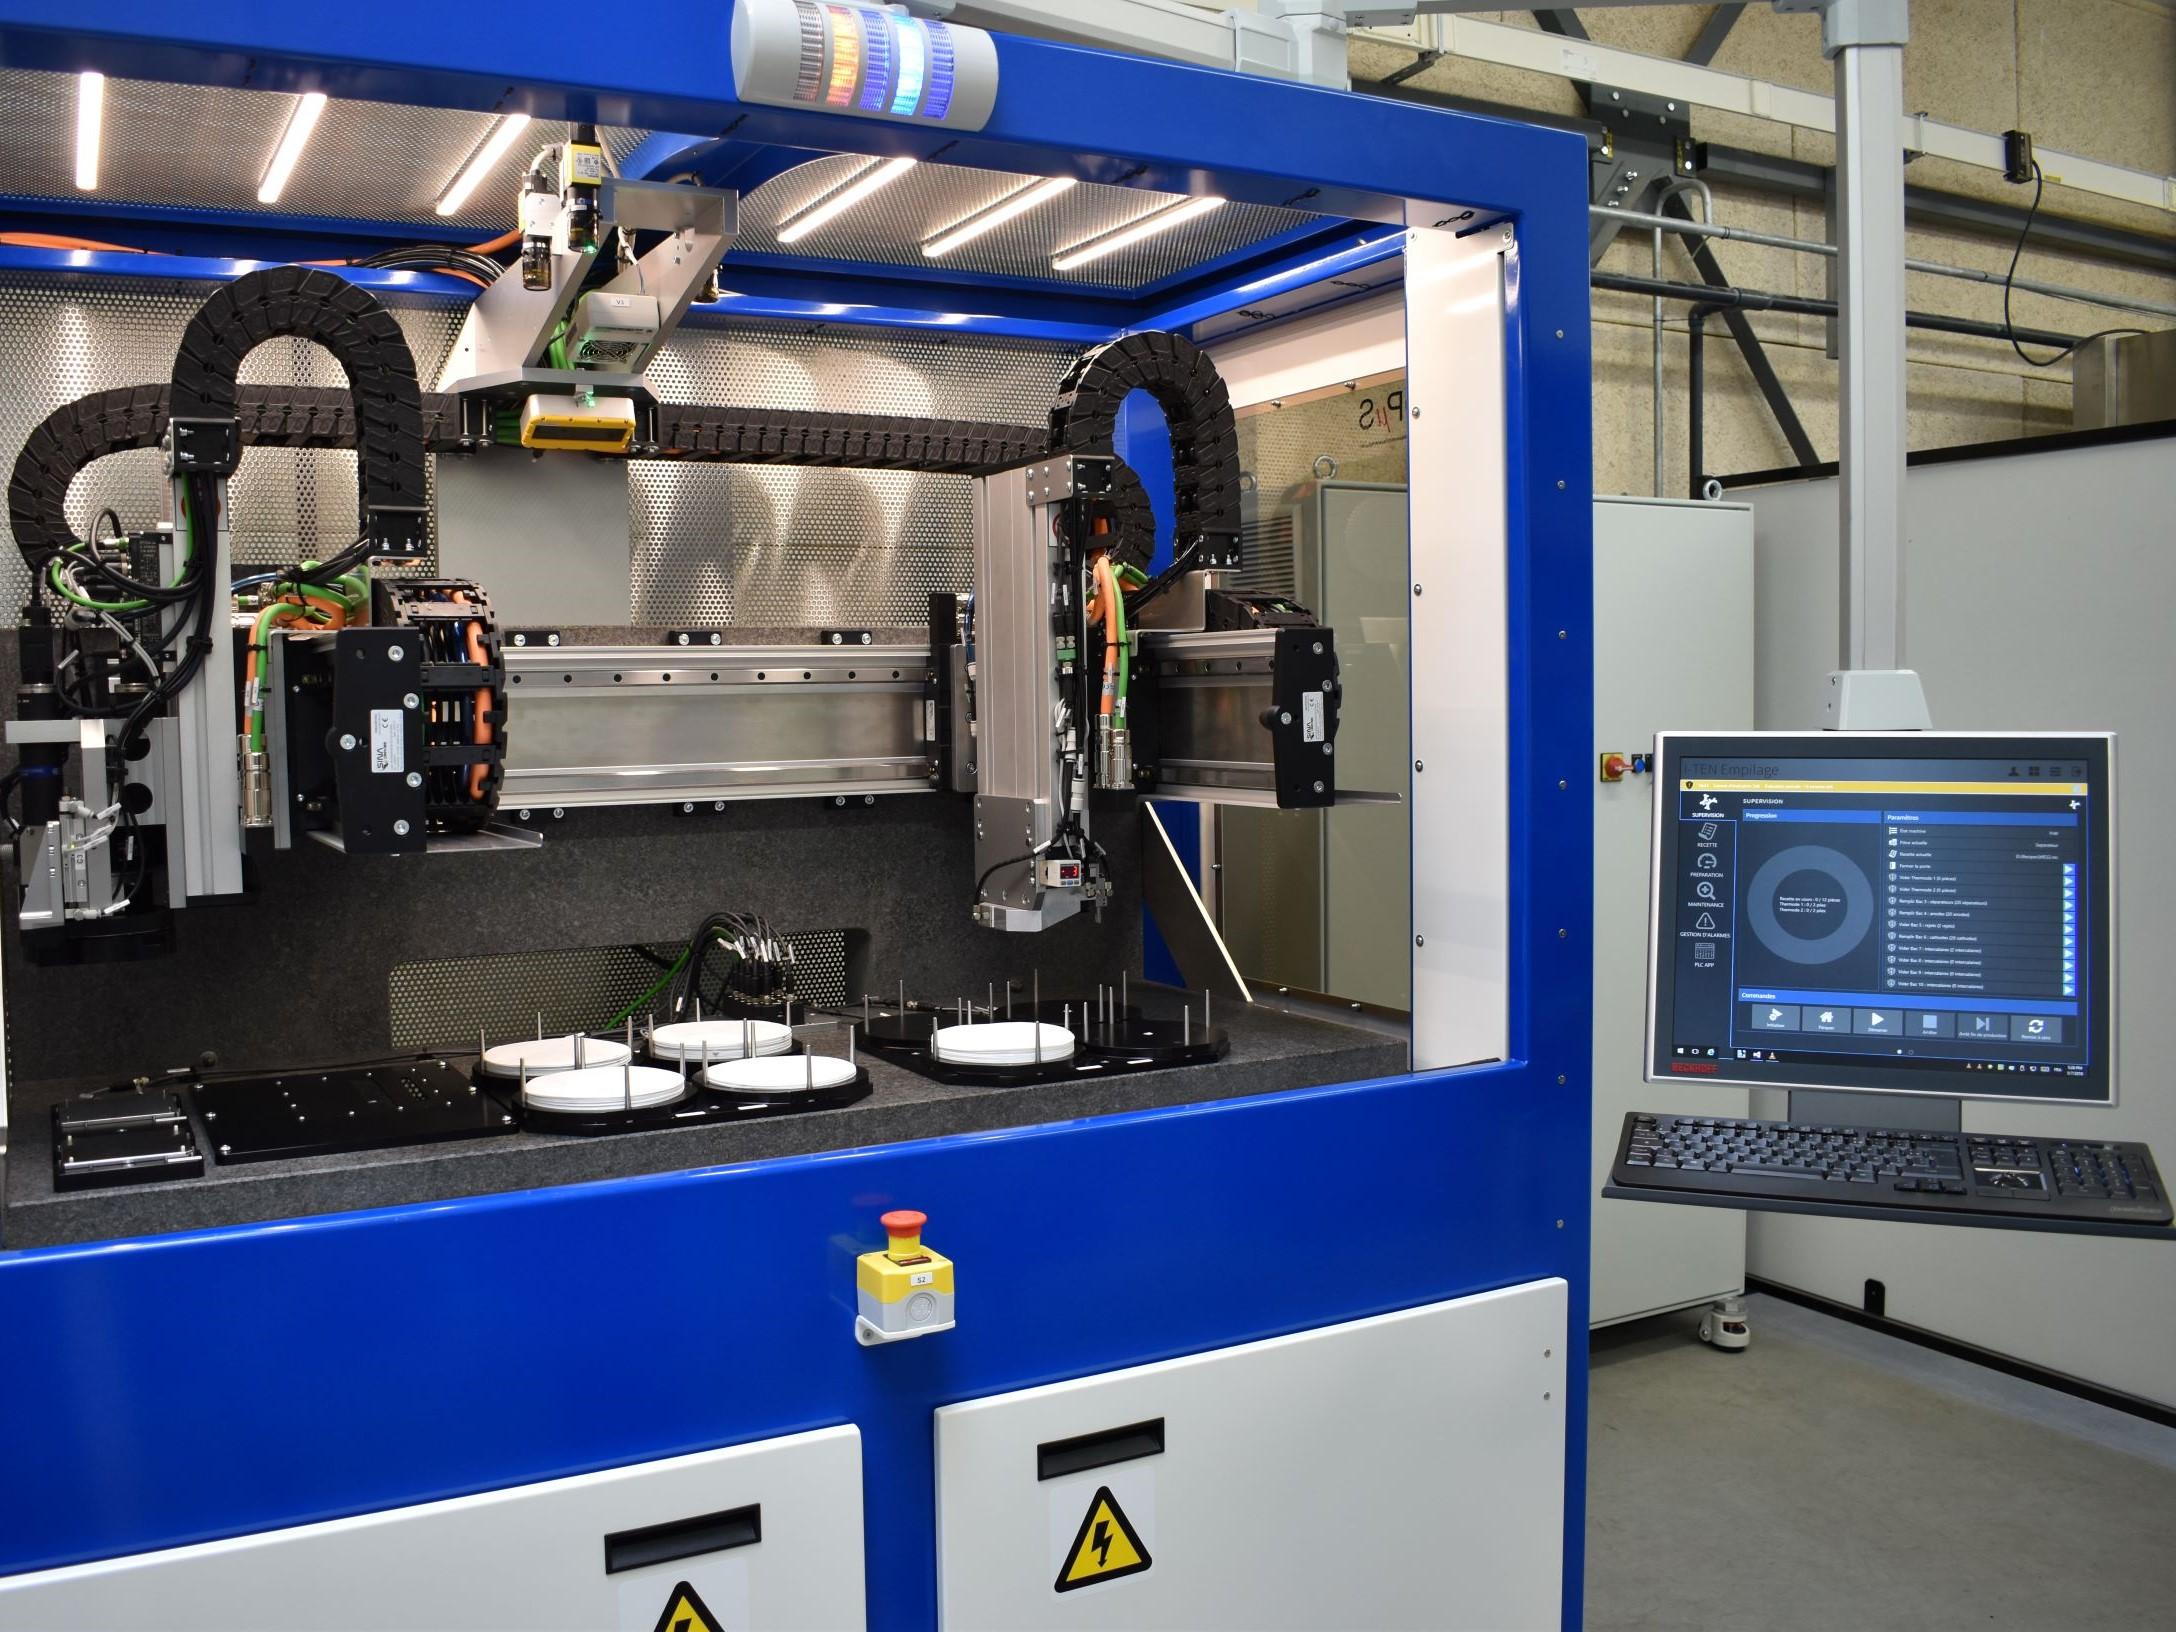 Automatic component pick & place machine